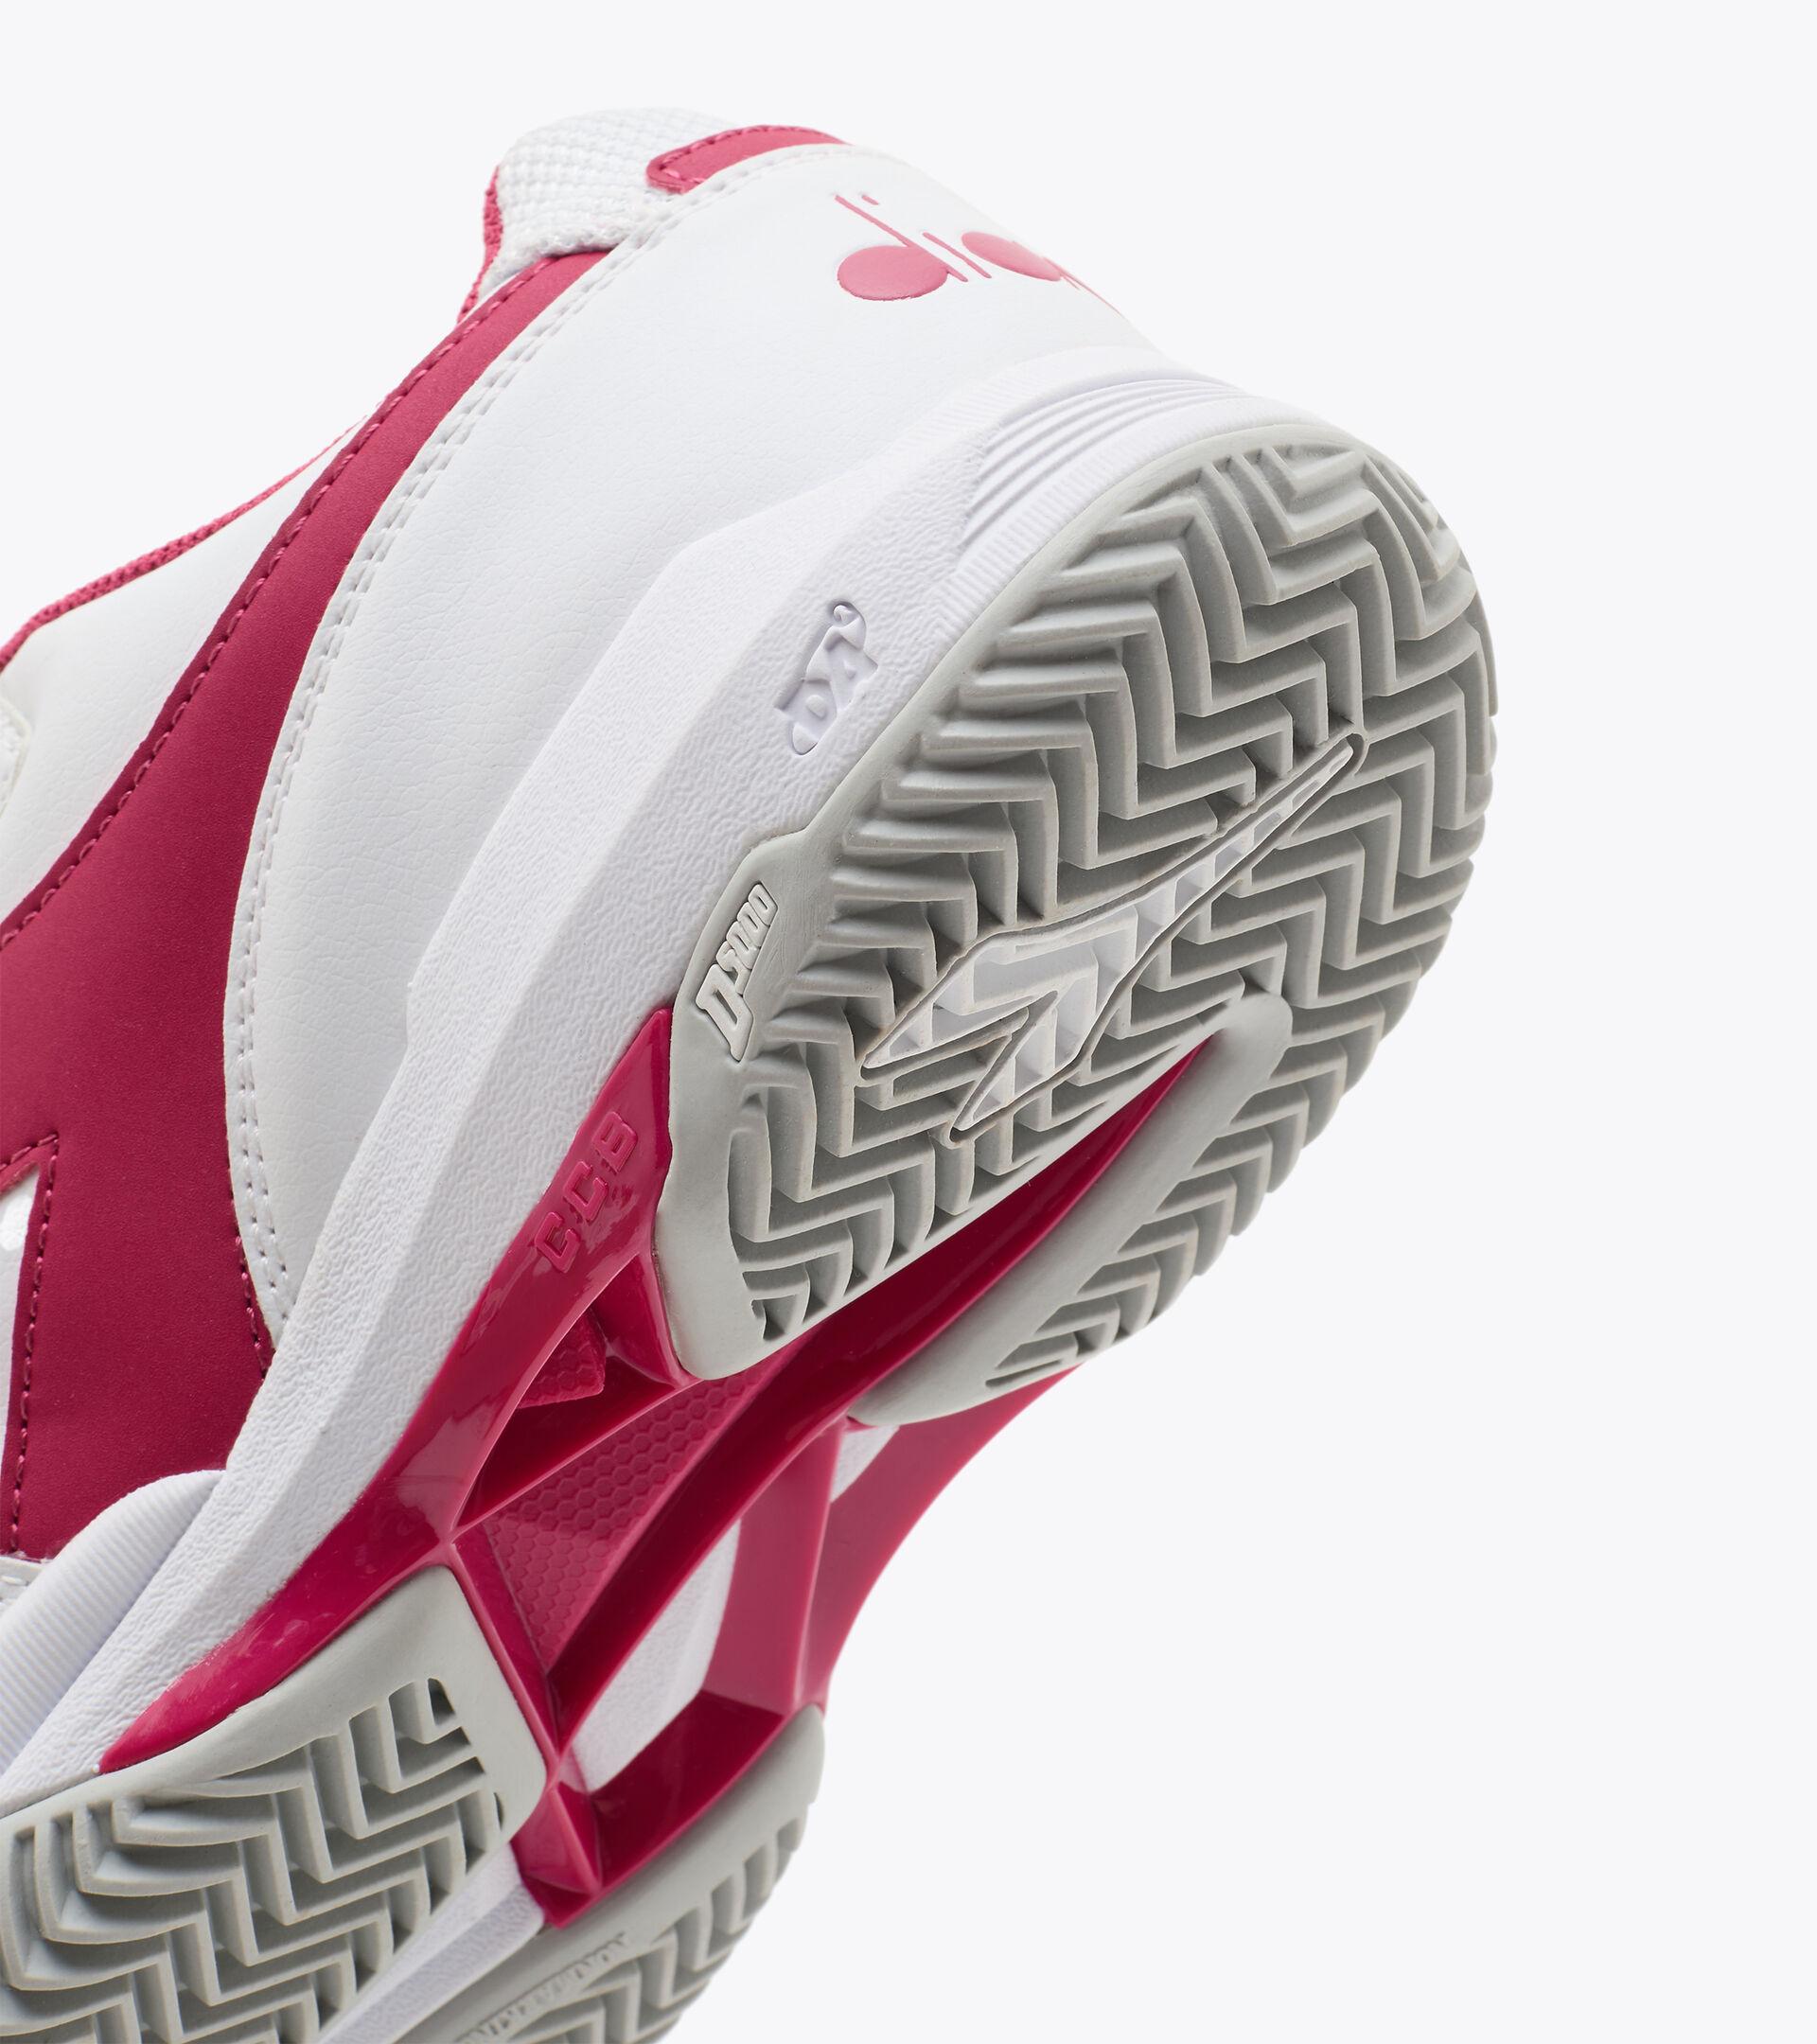 Footwear Sport DONNA S. CHALLENGE 3 W SL CLAY BIANCO/ROSA JAZZY Diadora